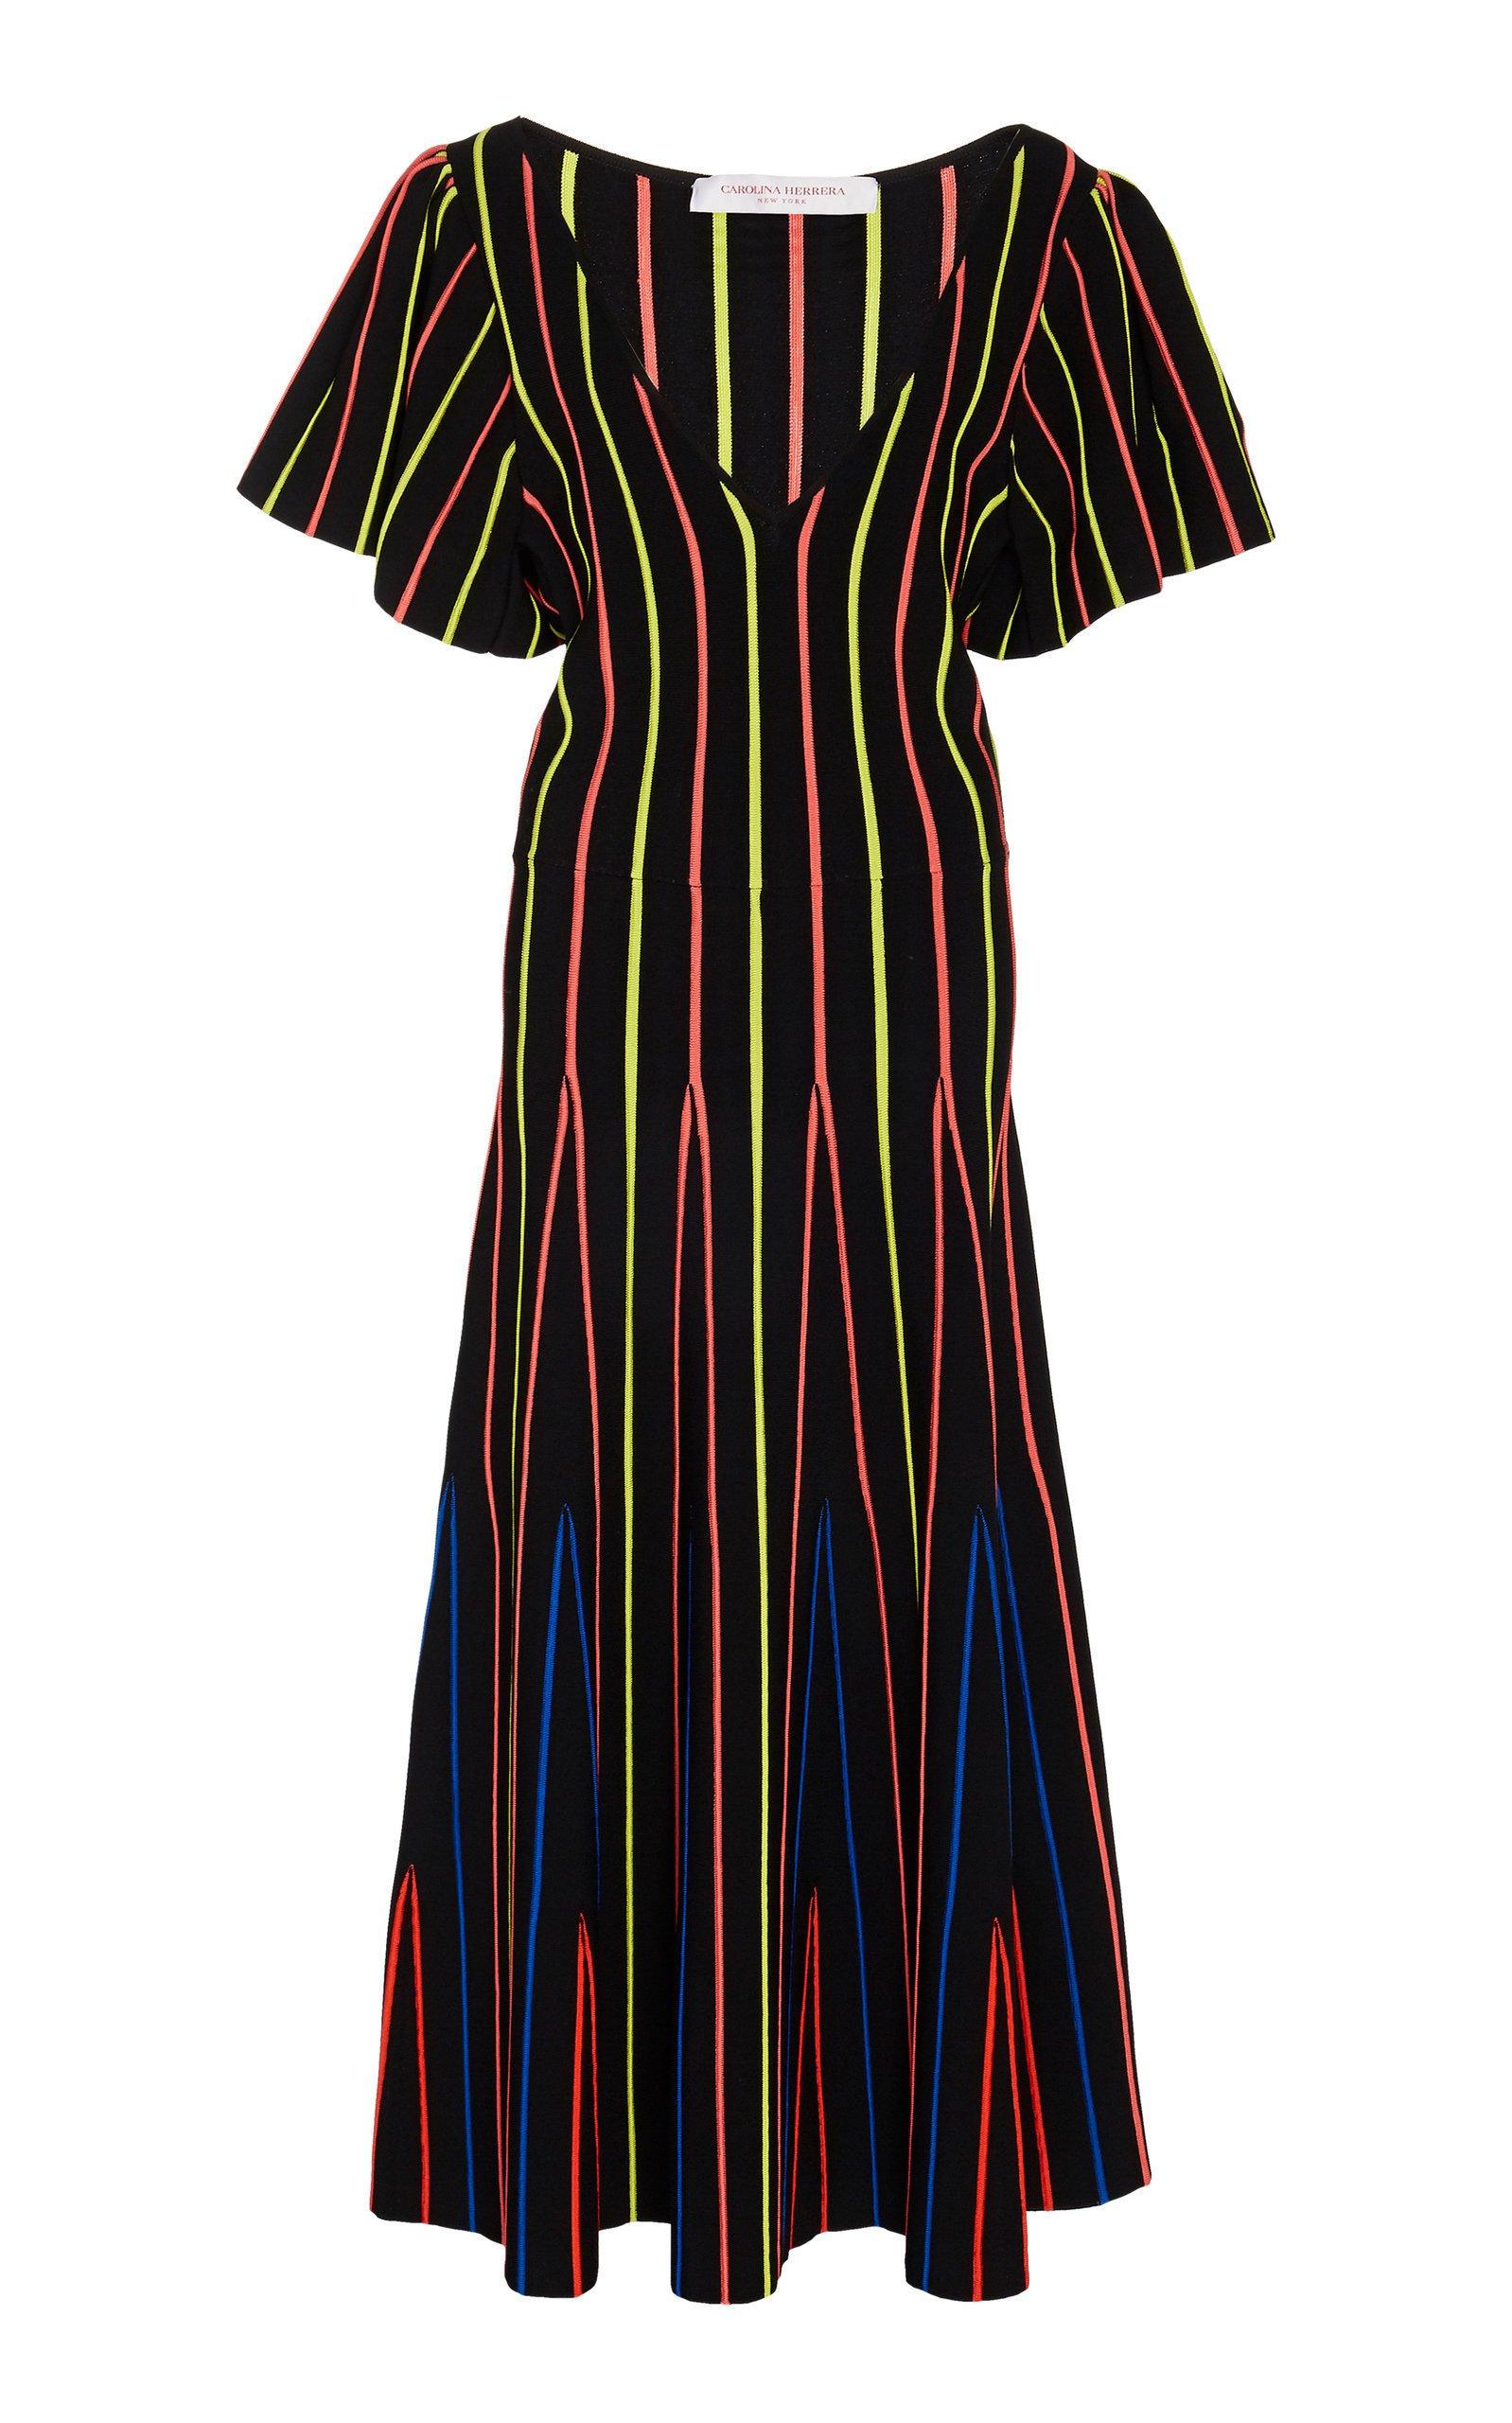 Carolina Herrera Striped Stretch-Knit Midi Dress